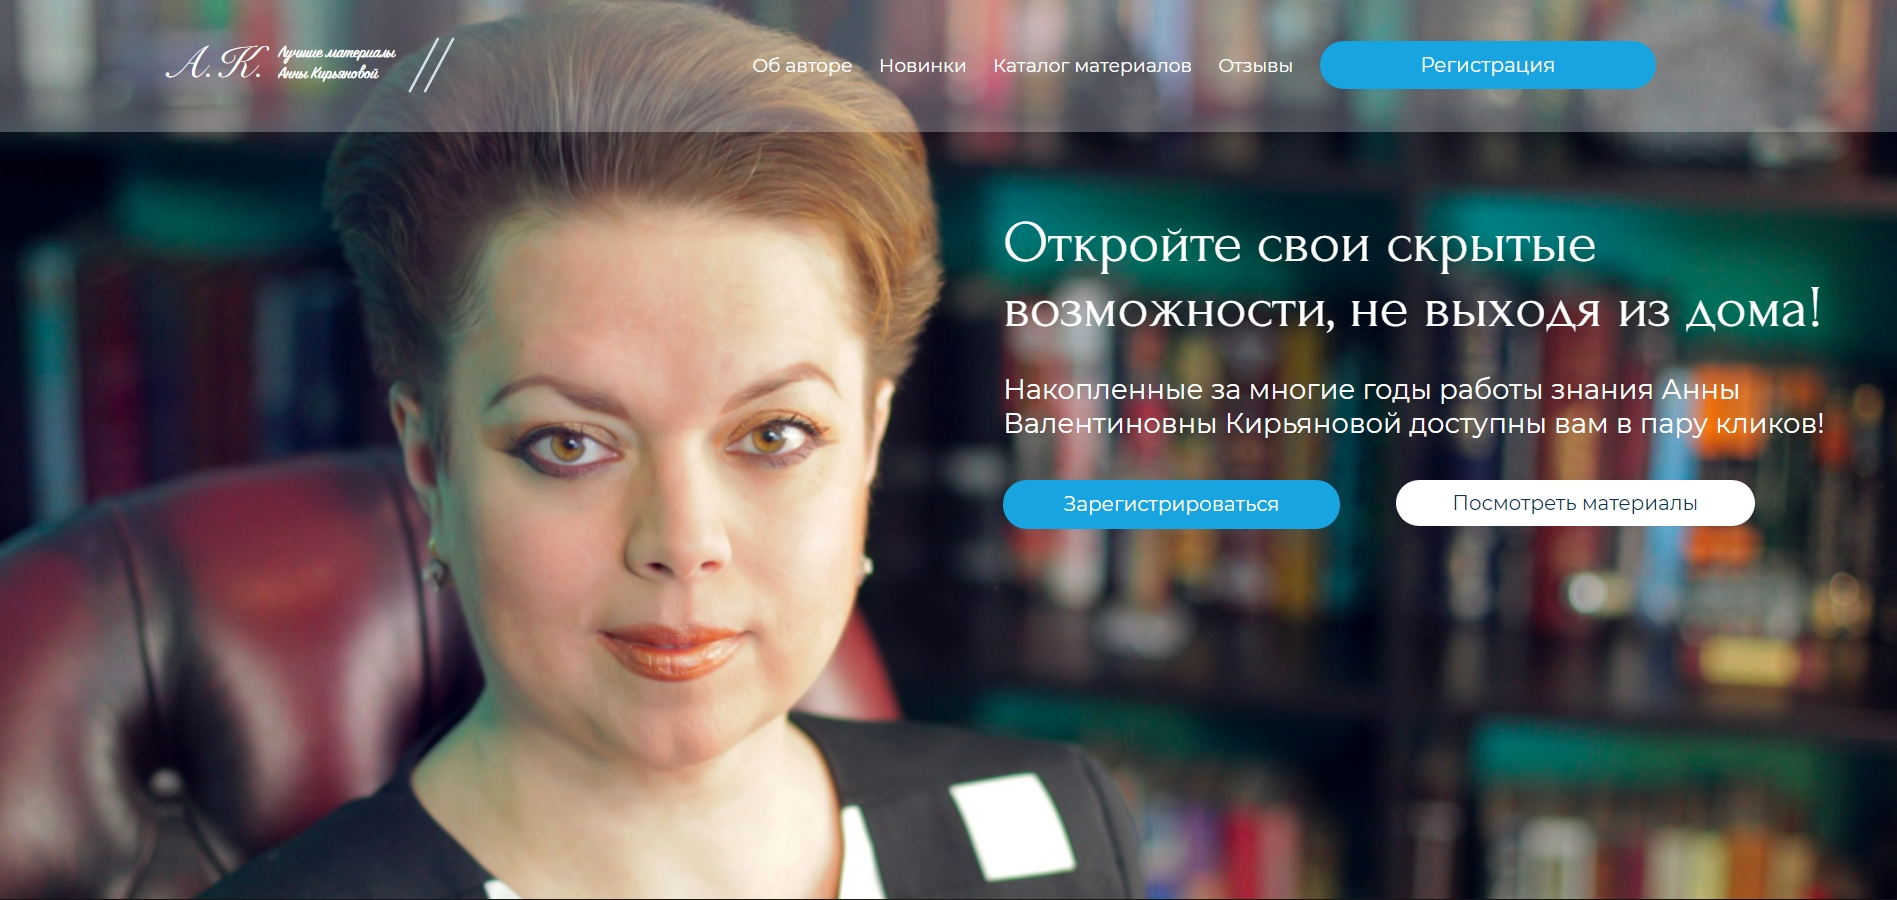 Личный сайт психолога. Главный экран.